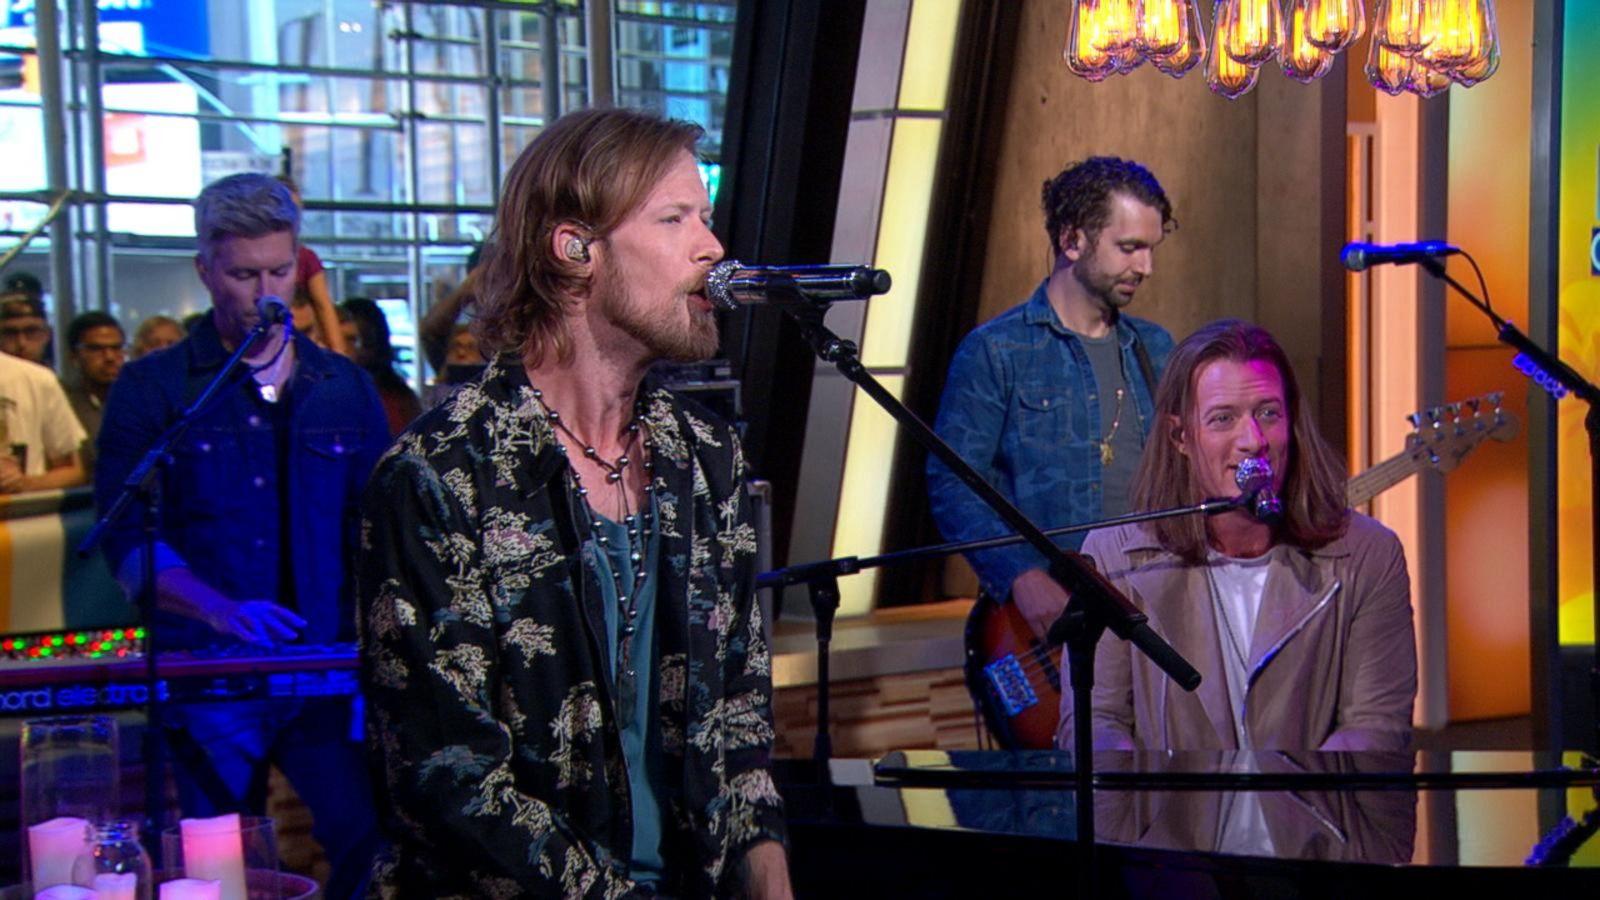 VIDEO: 'GMA' Country Playlist: Florida Georgia Line Sings 'H.O.L.Y.'